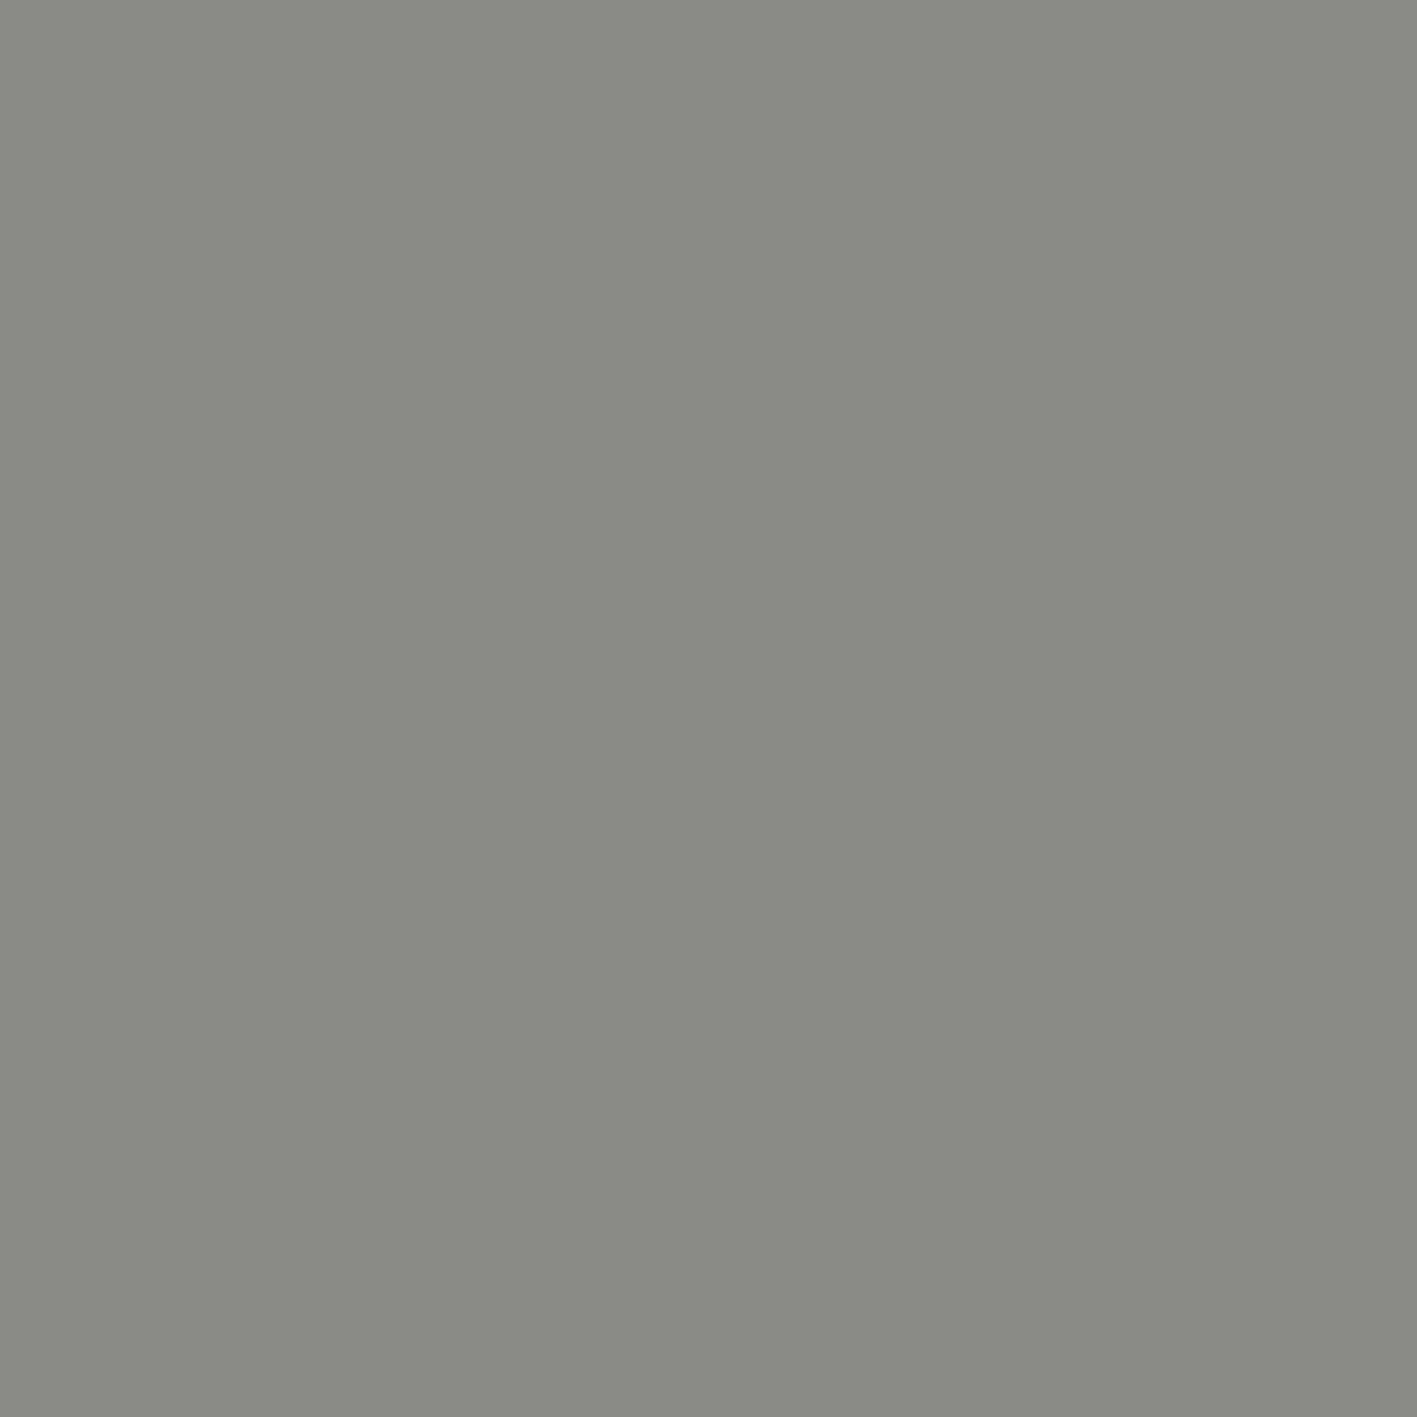 80ba33a coverlam basic gris 120×120 rgb